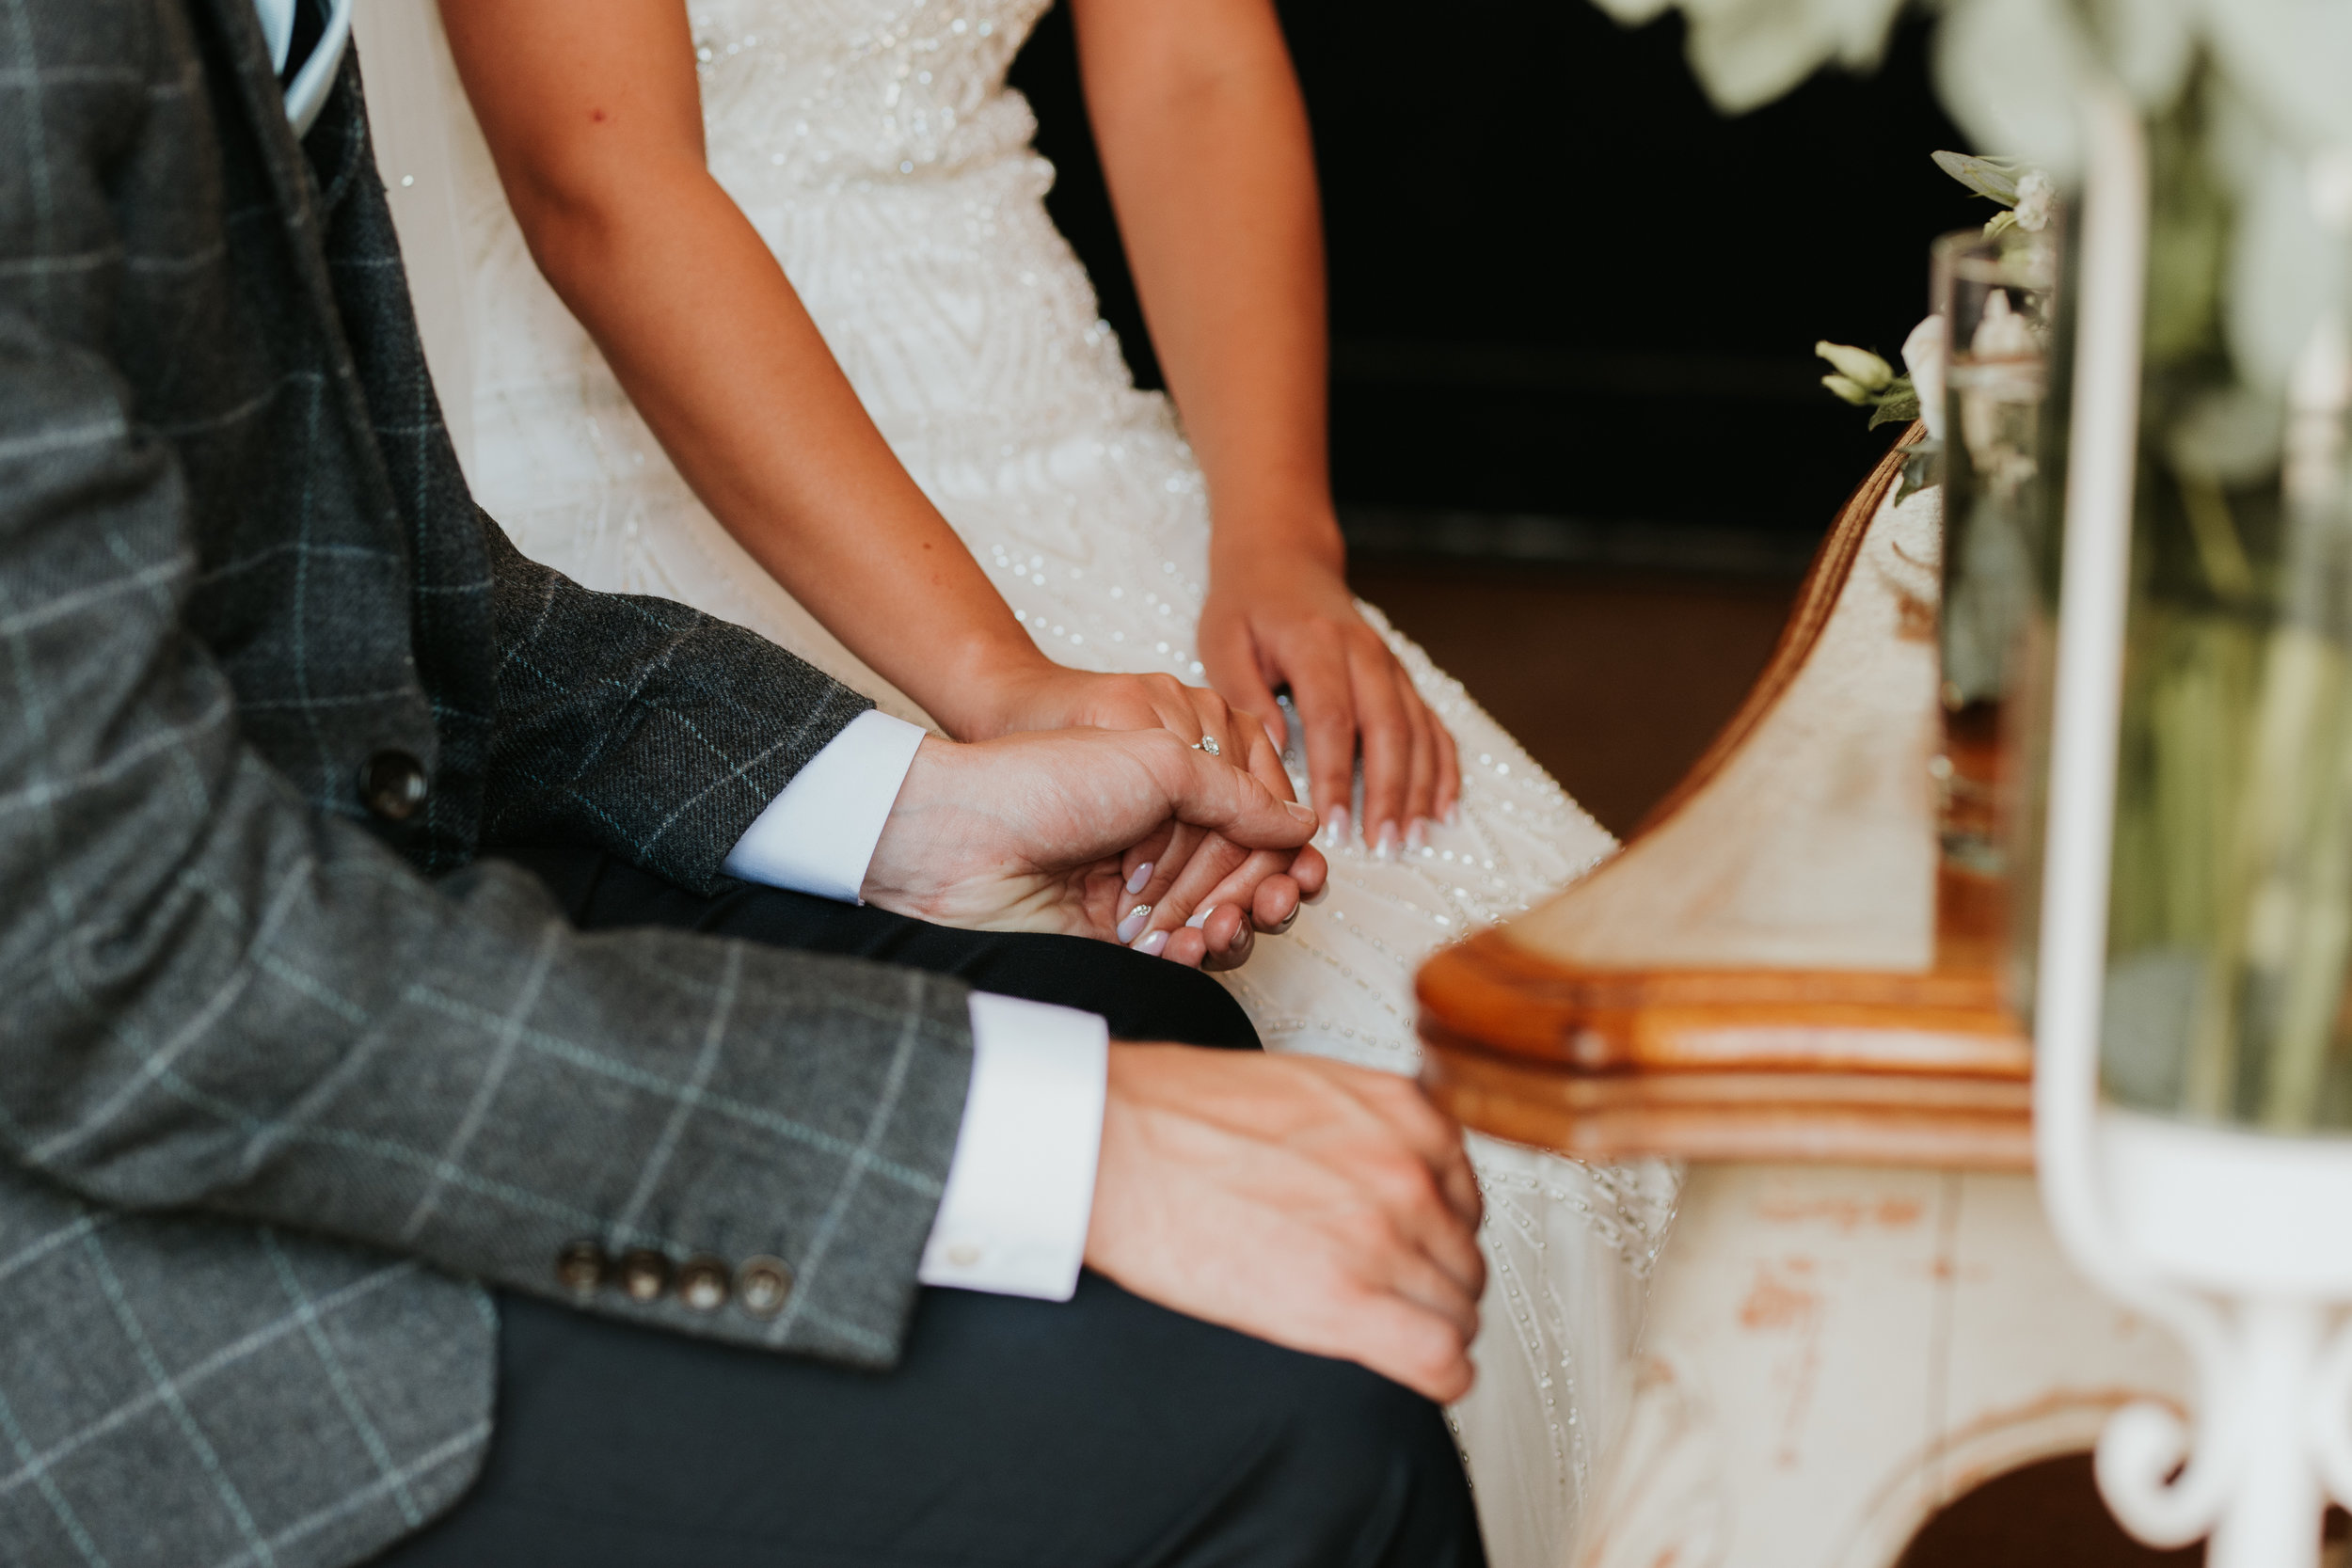 Oxfordshire-wedding-photographer-34.jpg